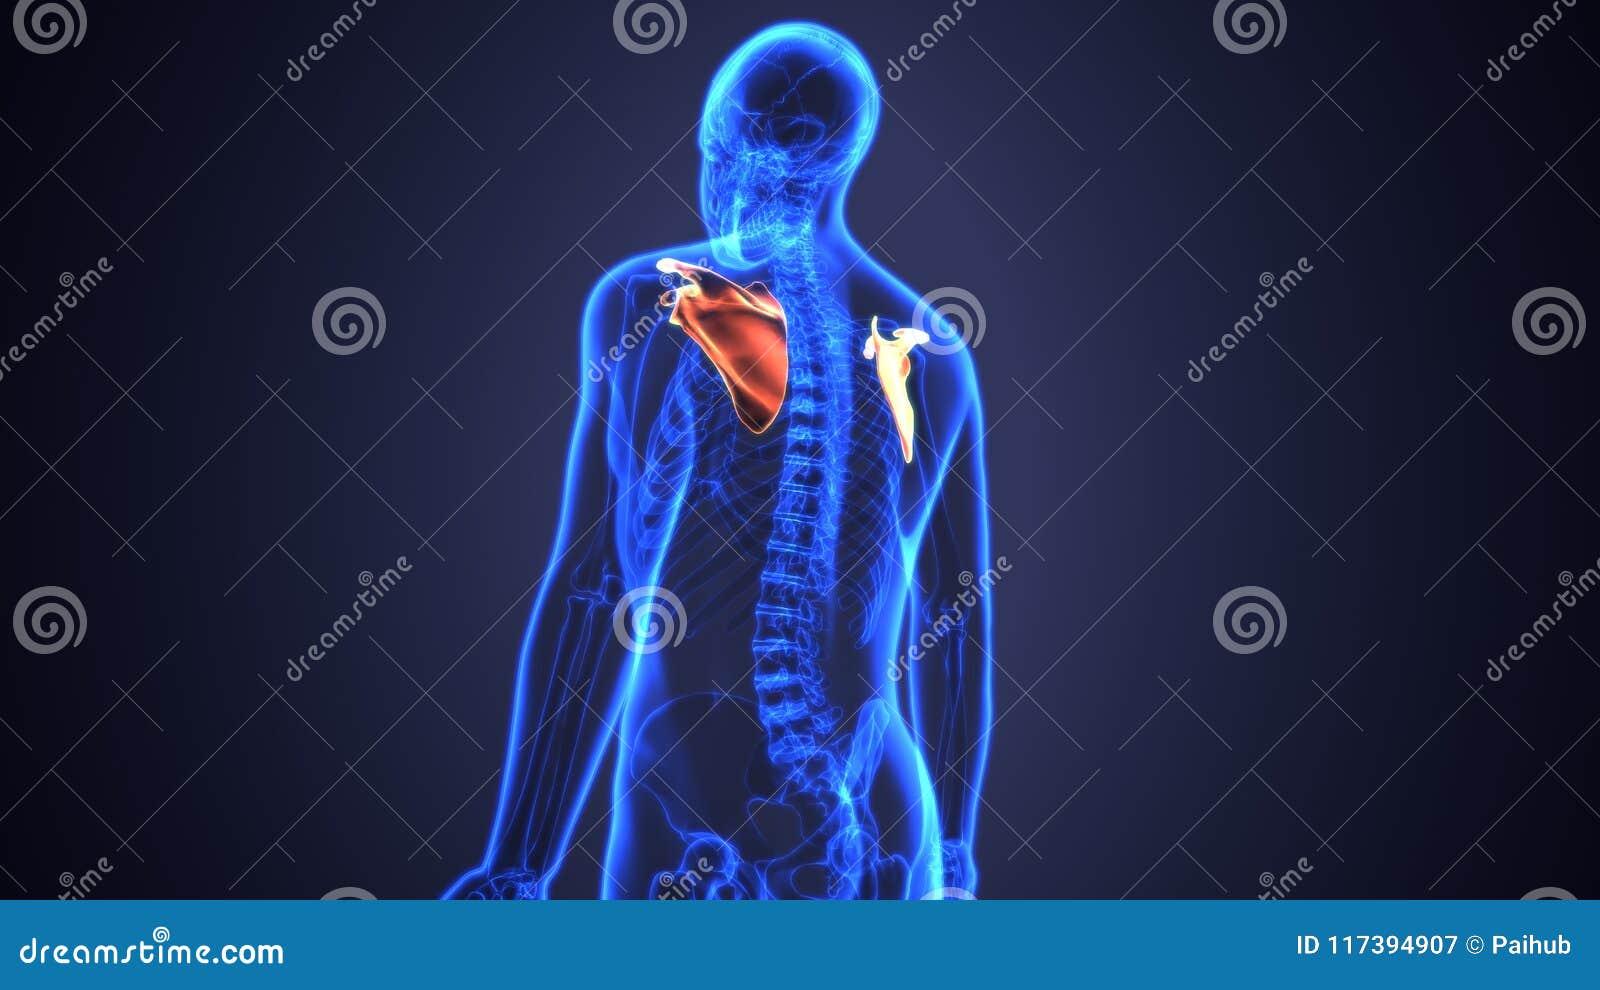 3D Illustration Of Human Body Bone Joint Pains Anatomy Scapula Stock ...